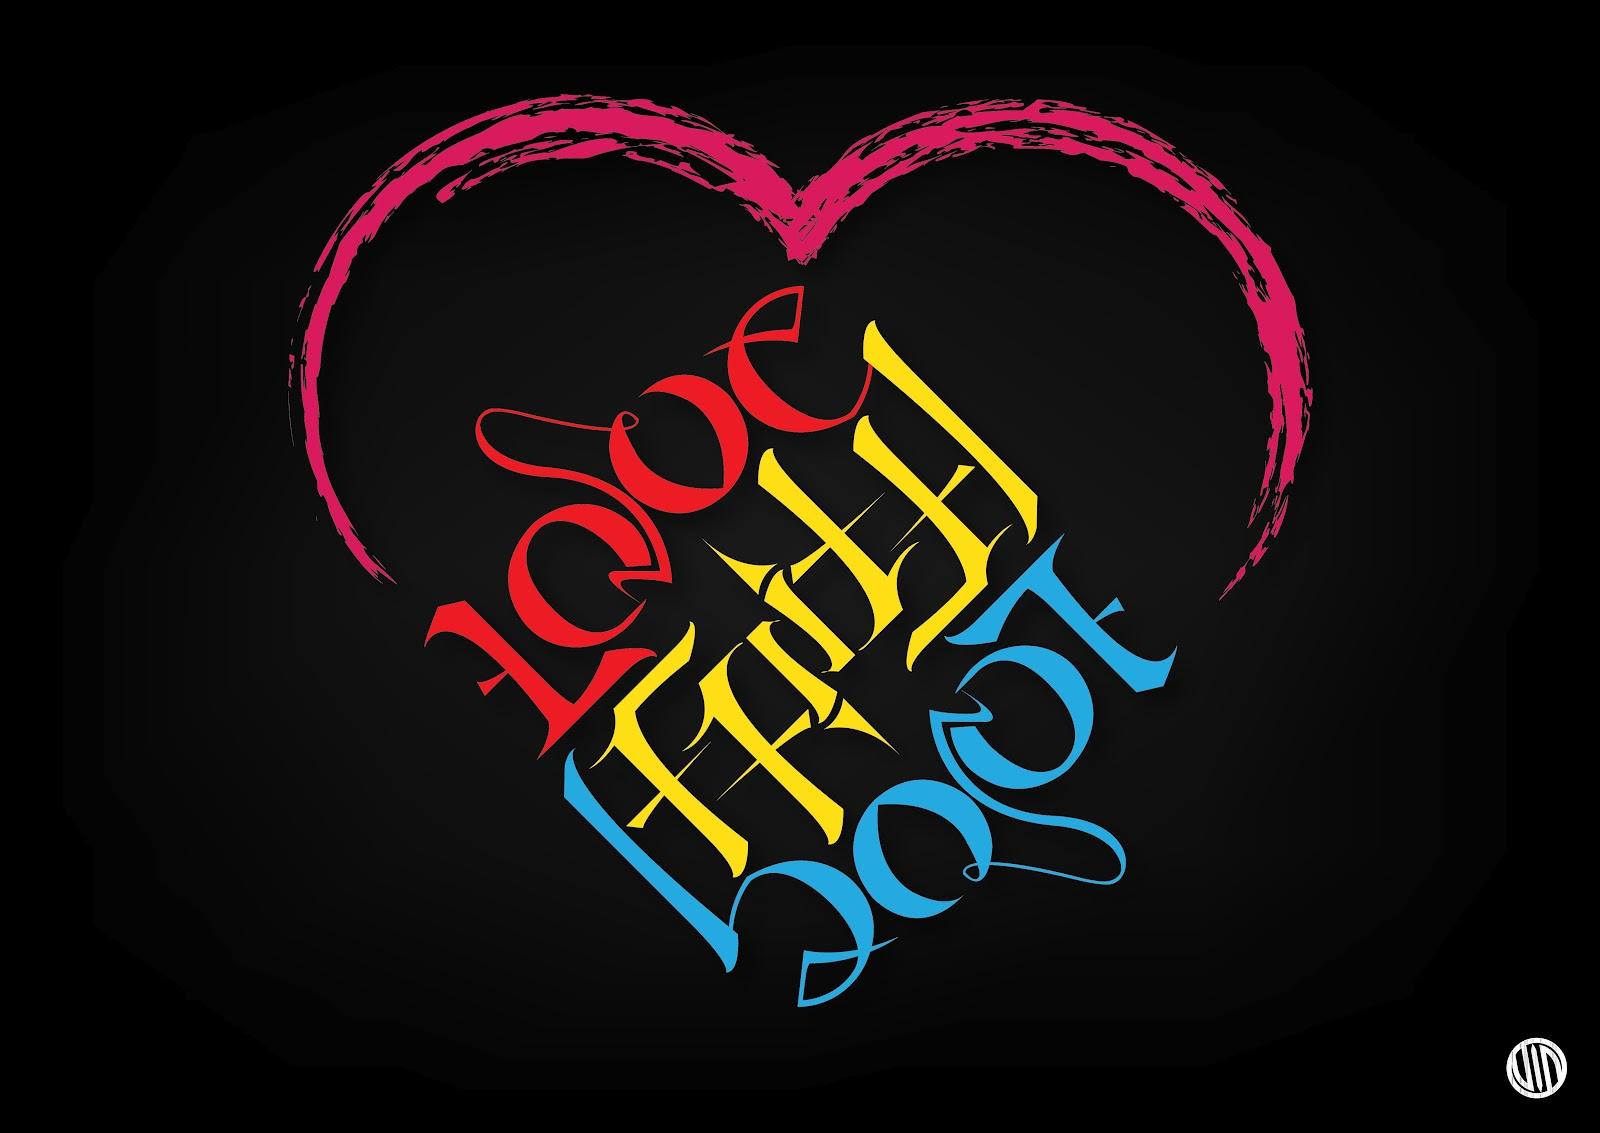 http://4.bp.blogspot.com/-qeRQZBvDcGk/T7aZFjvg2AI/AAAAAAAAANI/istesiG9NXQ/s1600/Love-faith-hope.jpg